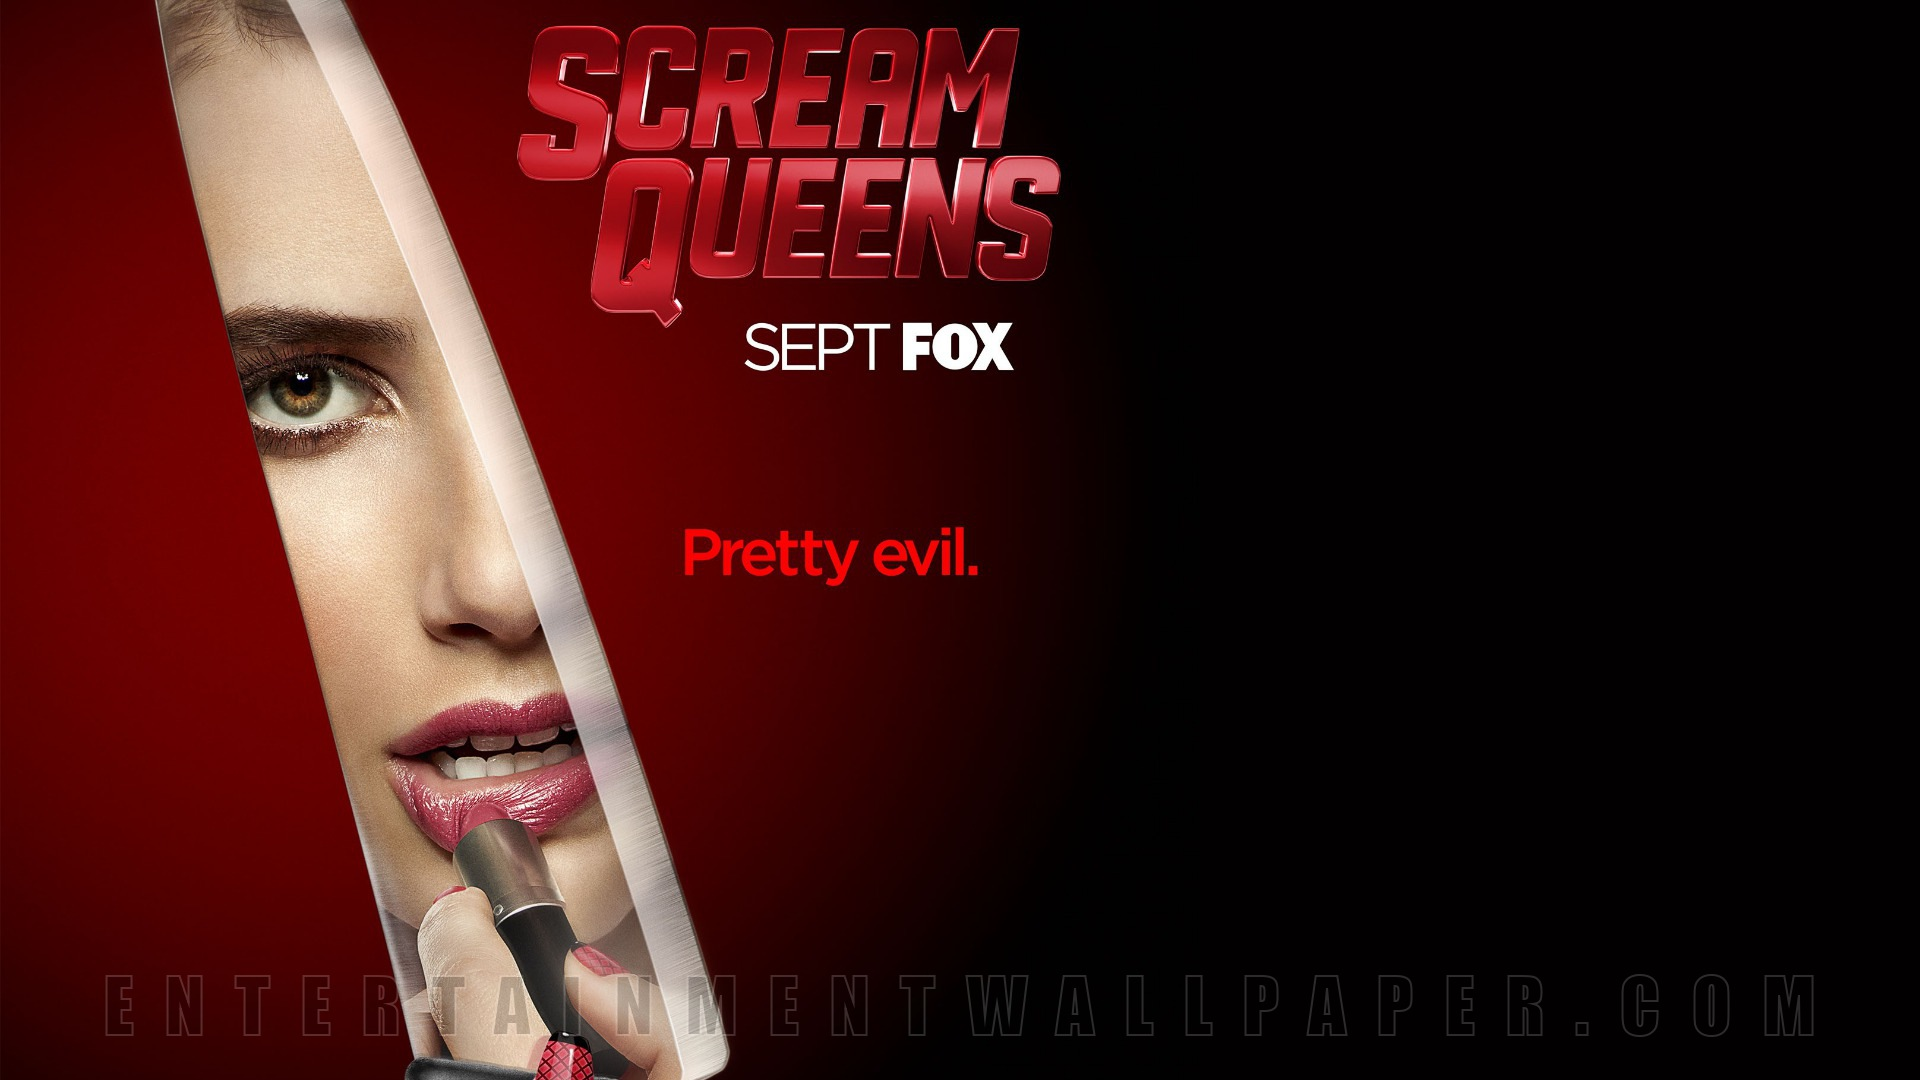 Scream Queens Fondo De Pantalla Scream Queens Fox Fondo